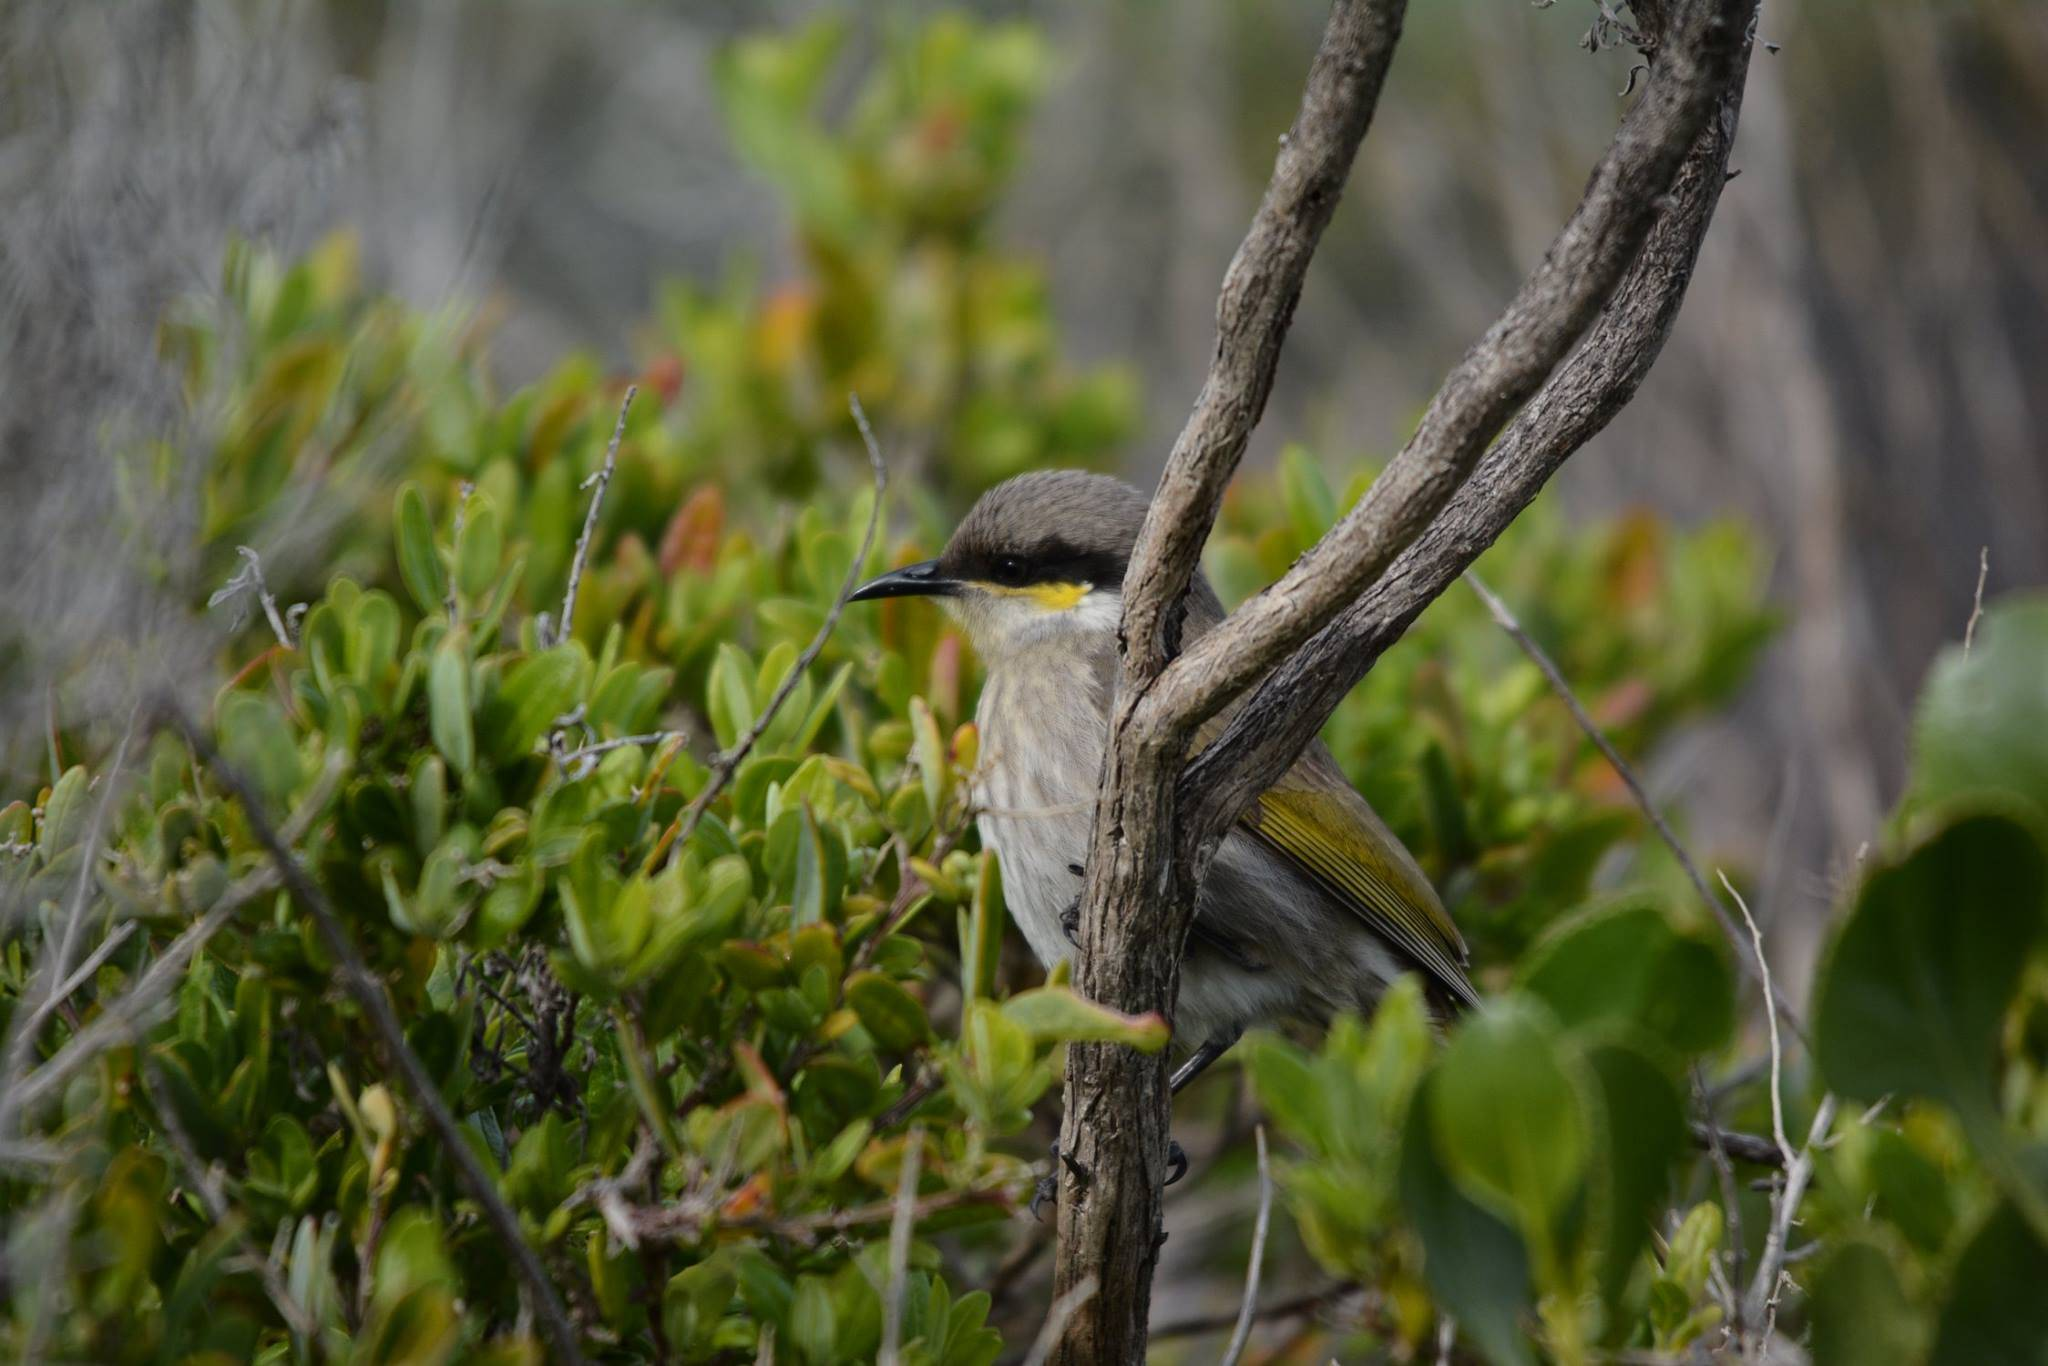 Bird in tree in Australia